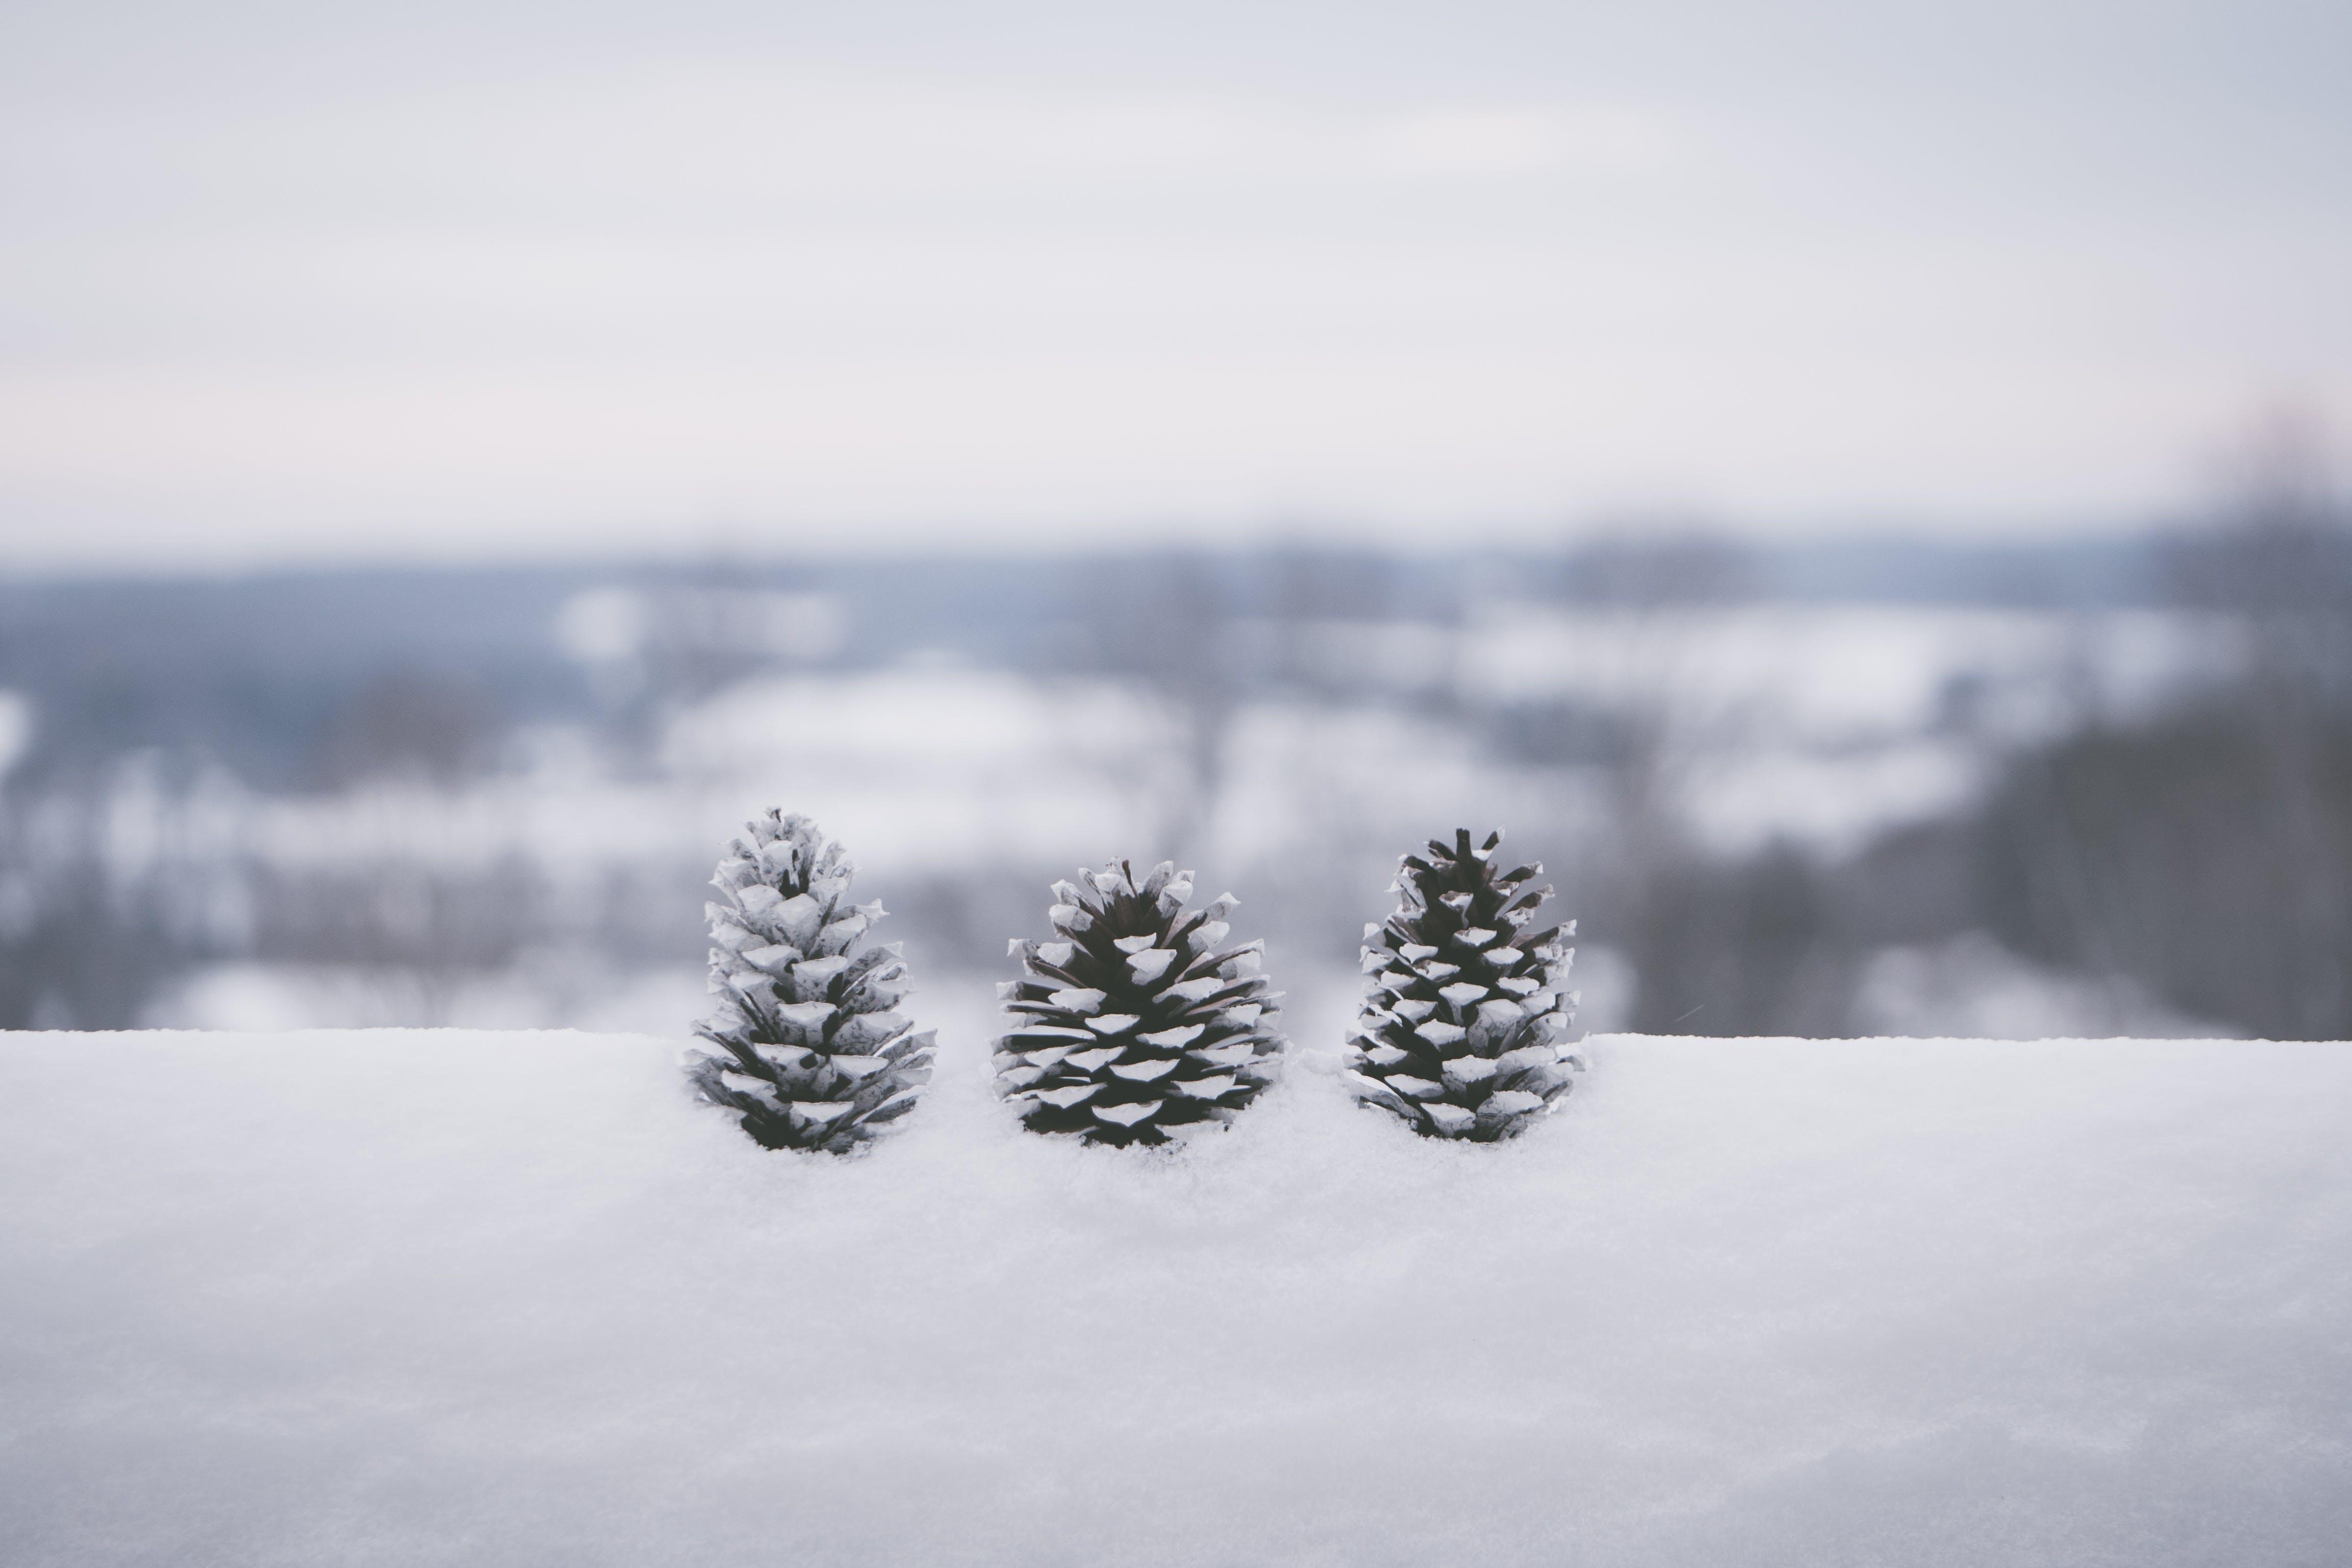 Selective Focus Photography Of Three Pine Cones